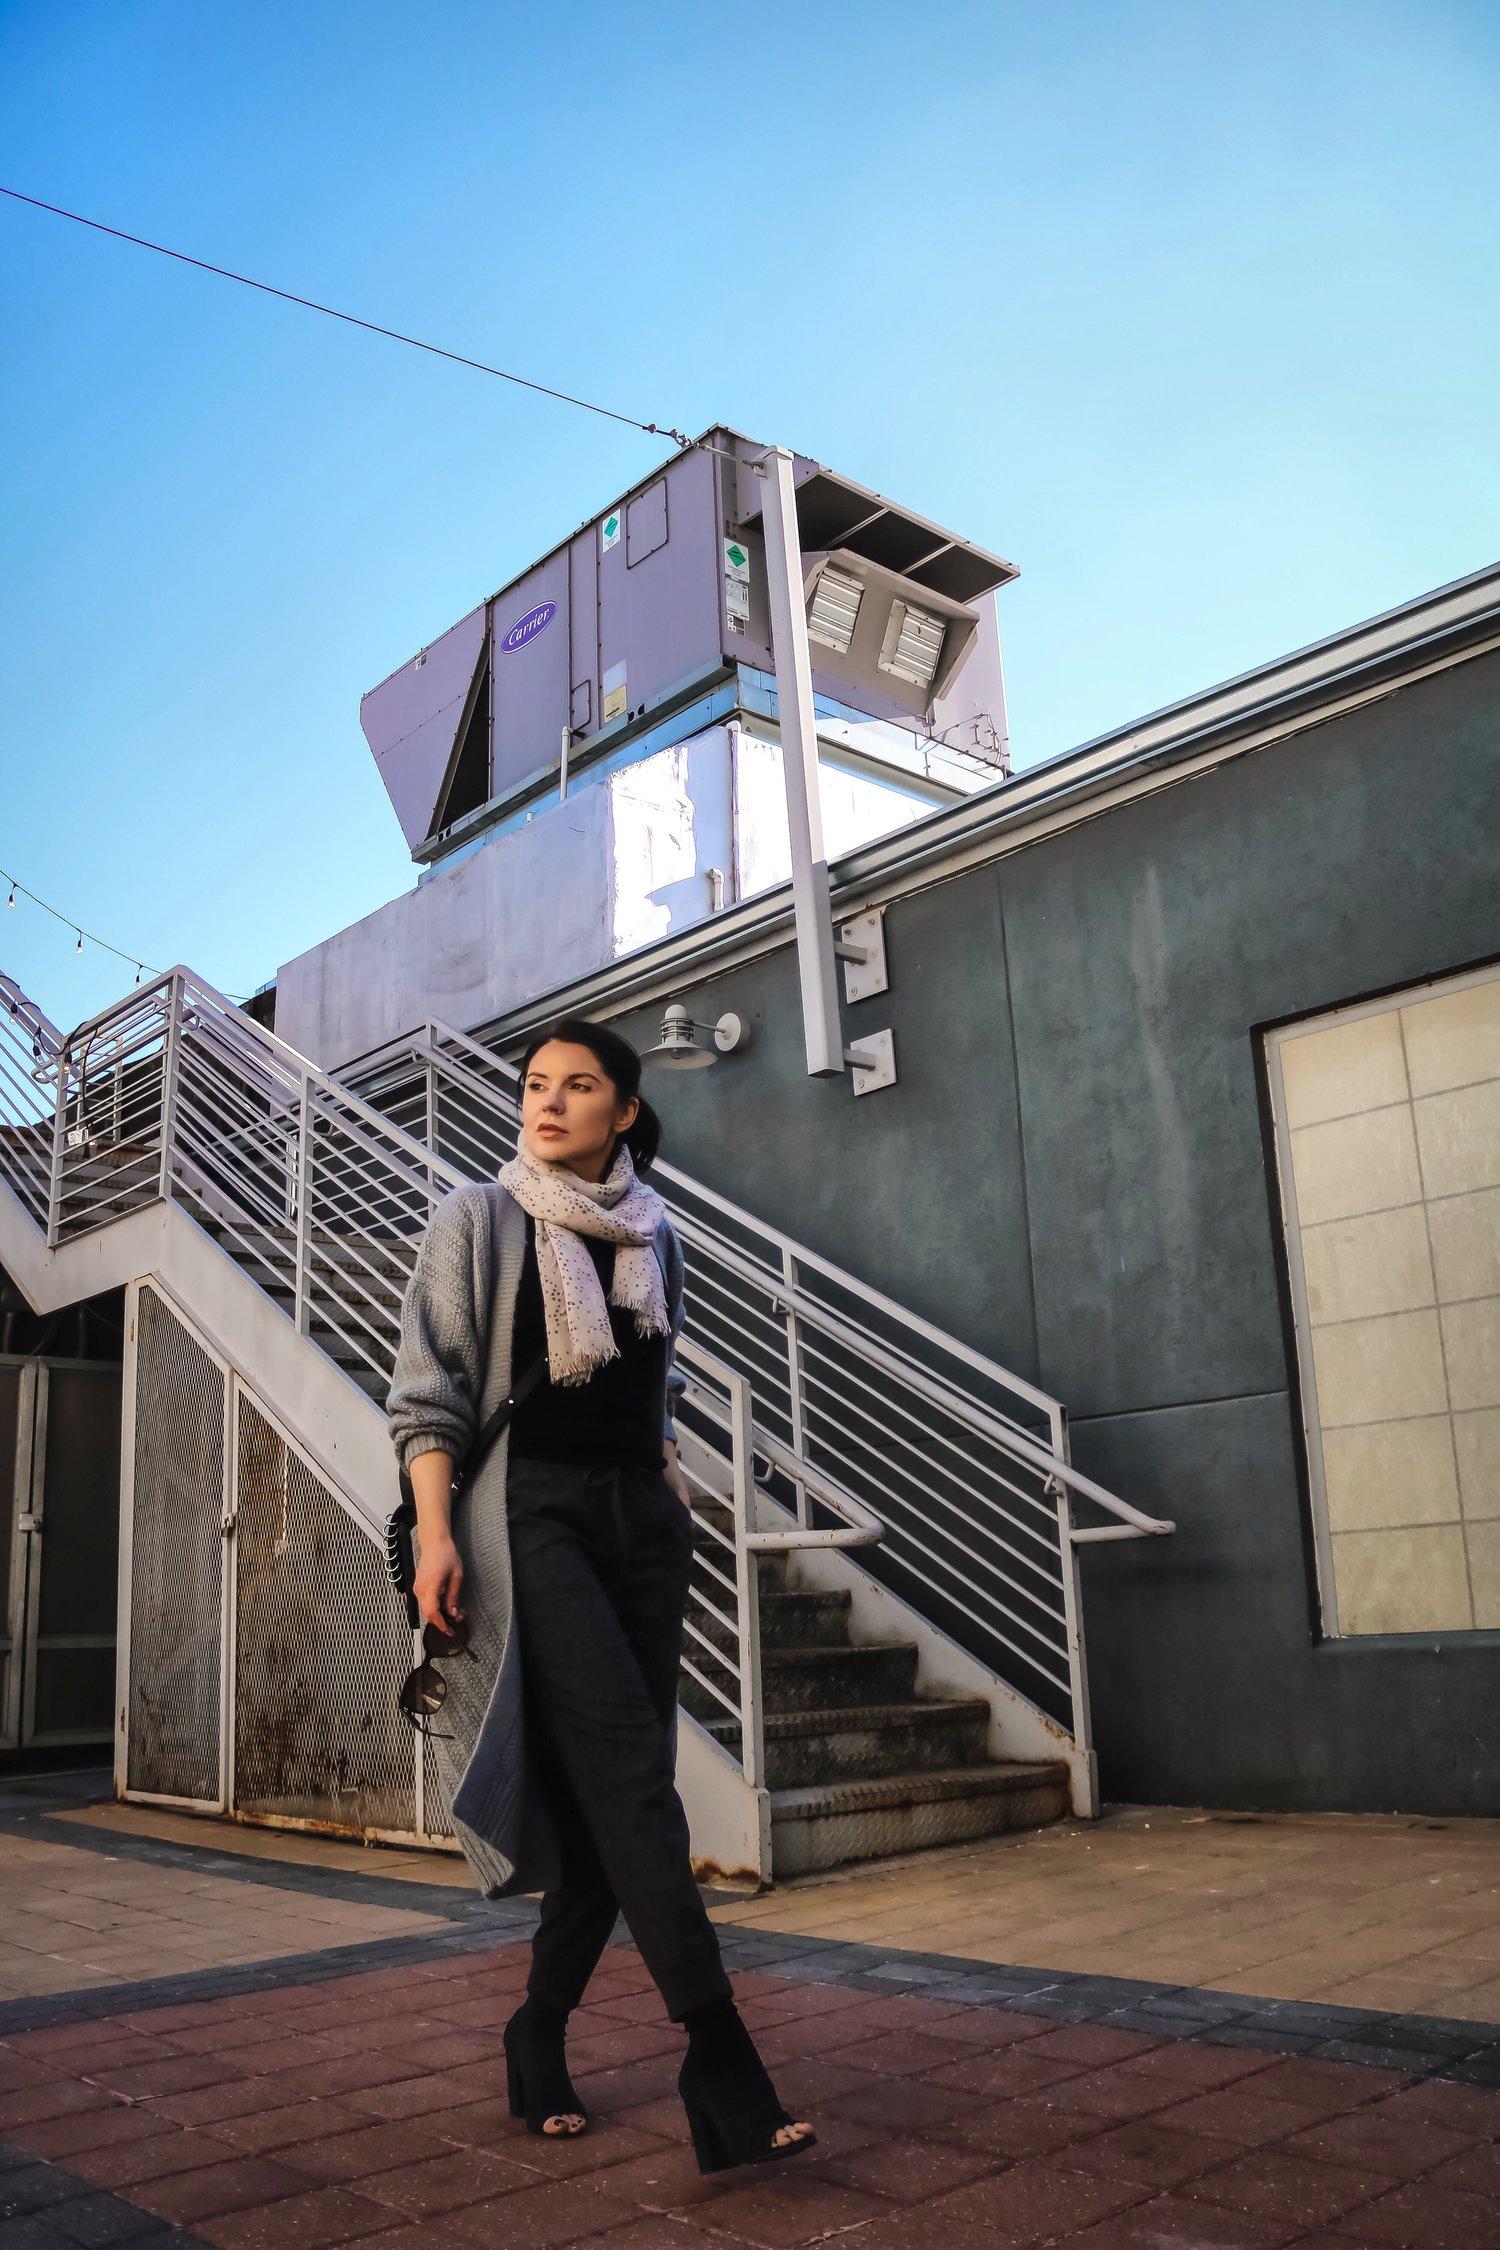 Isabel-Alexander-airport-outfit-walking.jpeg